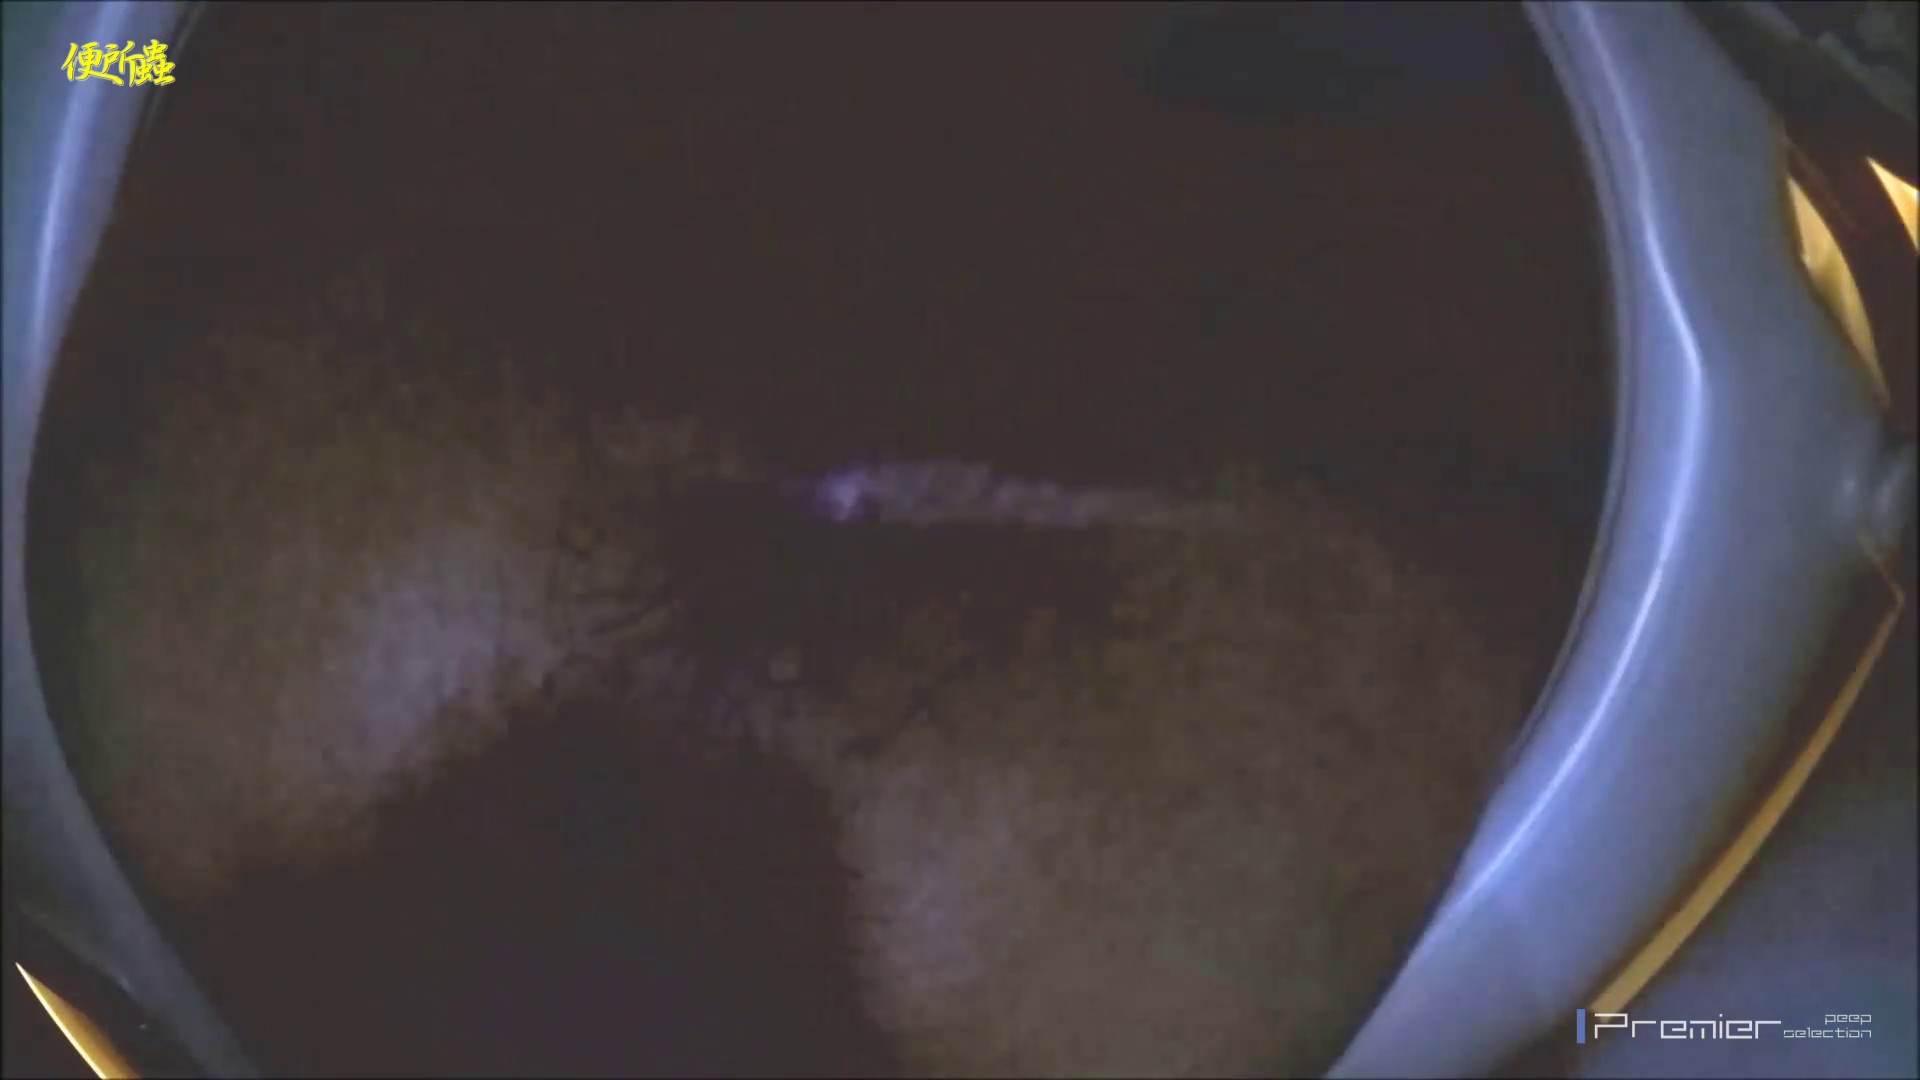 vol.06 便所蟲さんのリターン~寺子屋洗面所盗撮~ 洗面所 濡れ場動画紹介 91連発 79